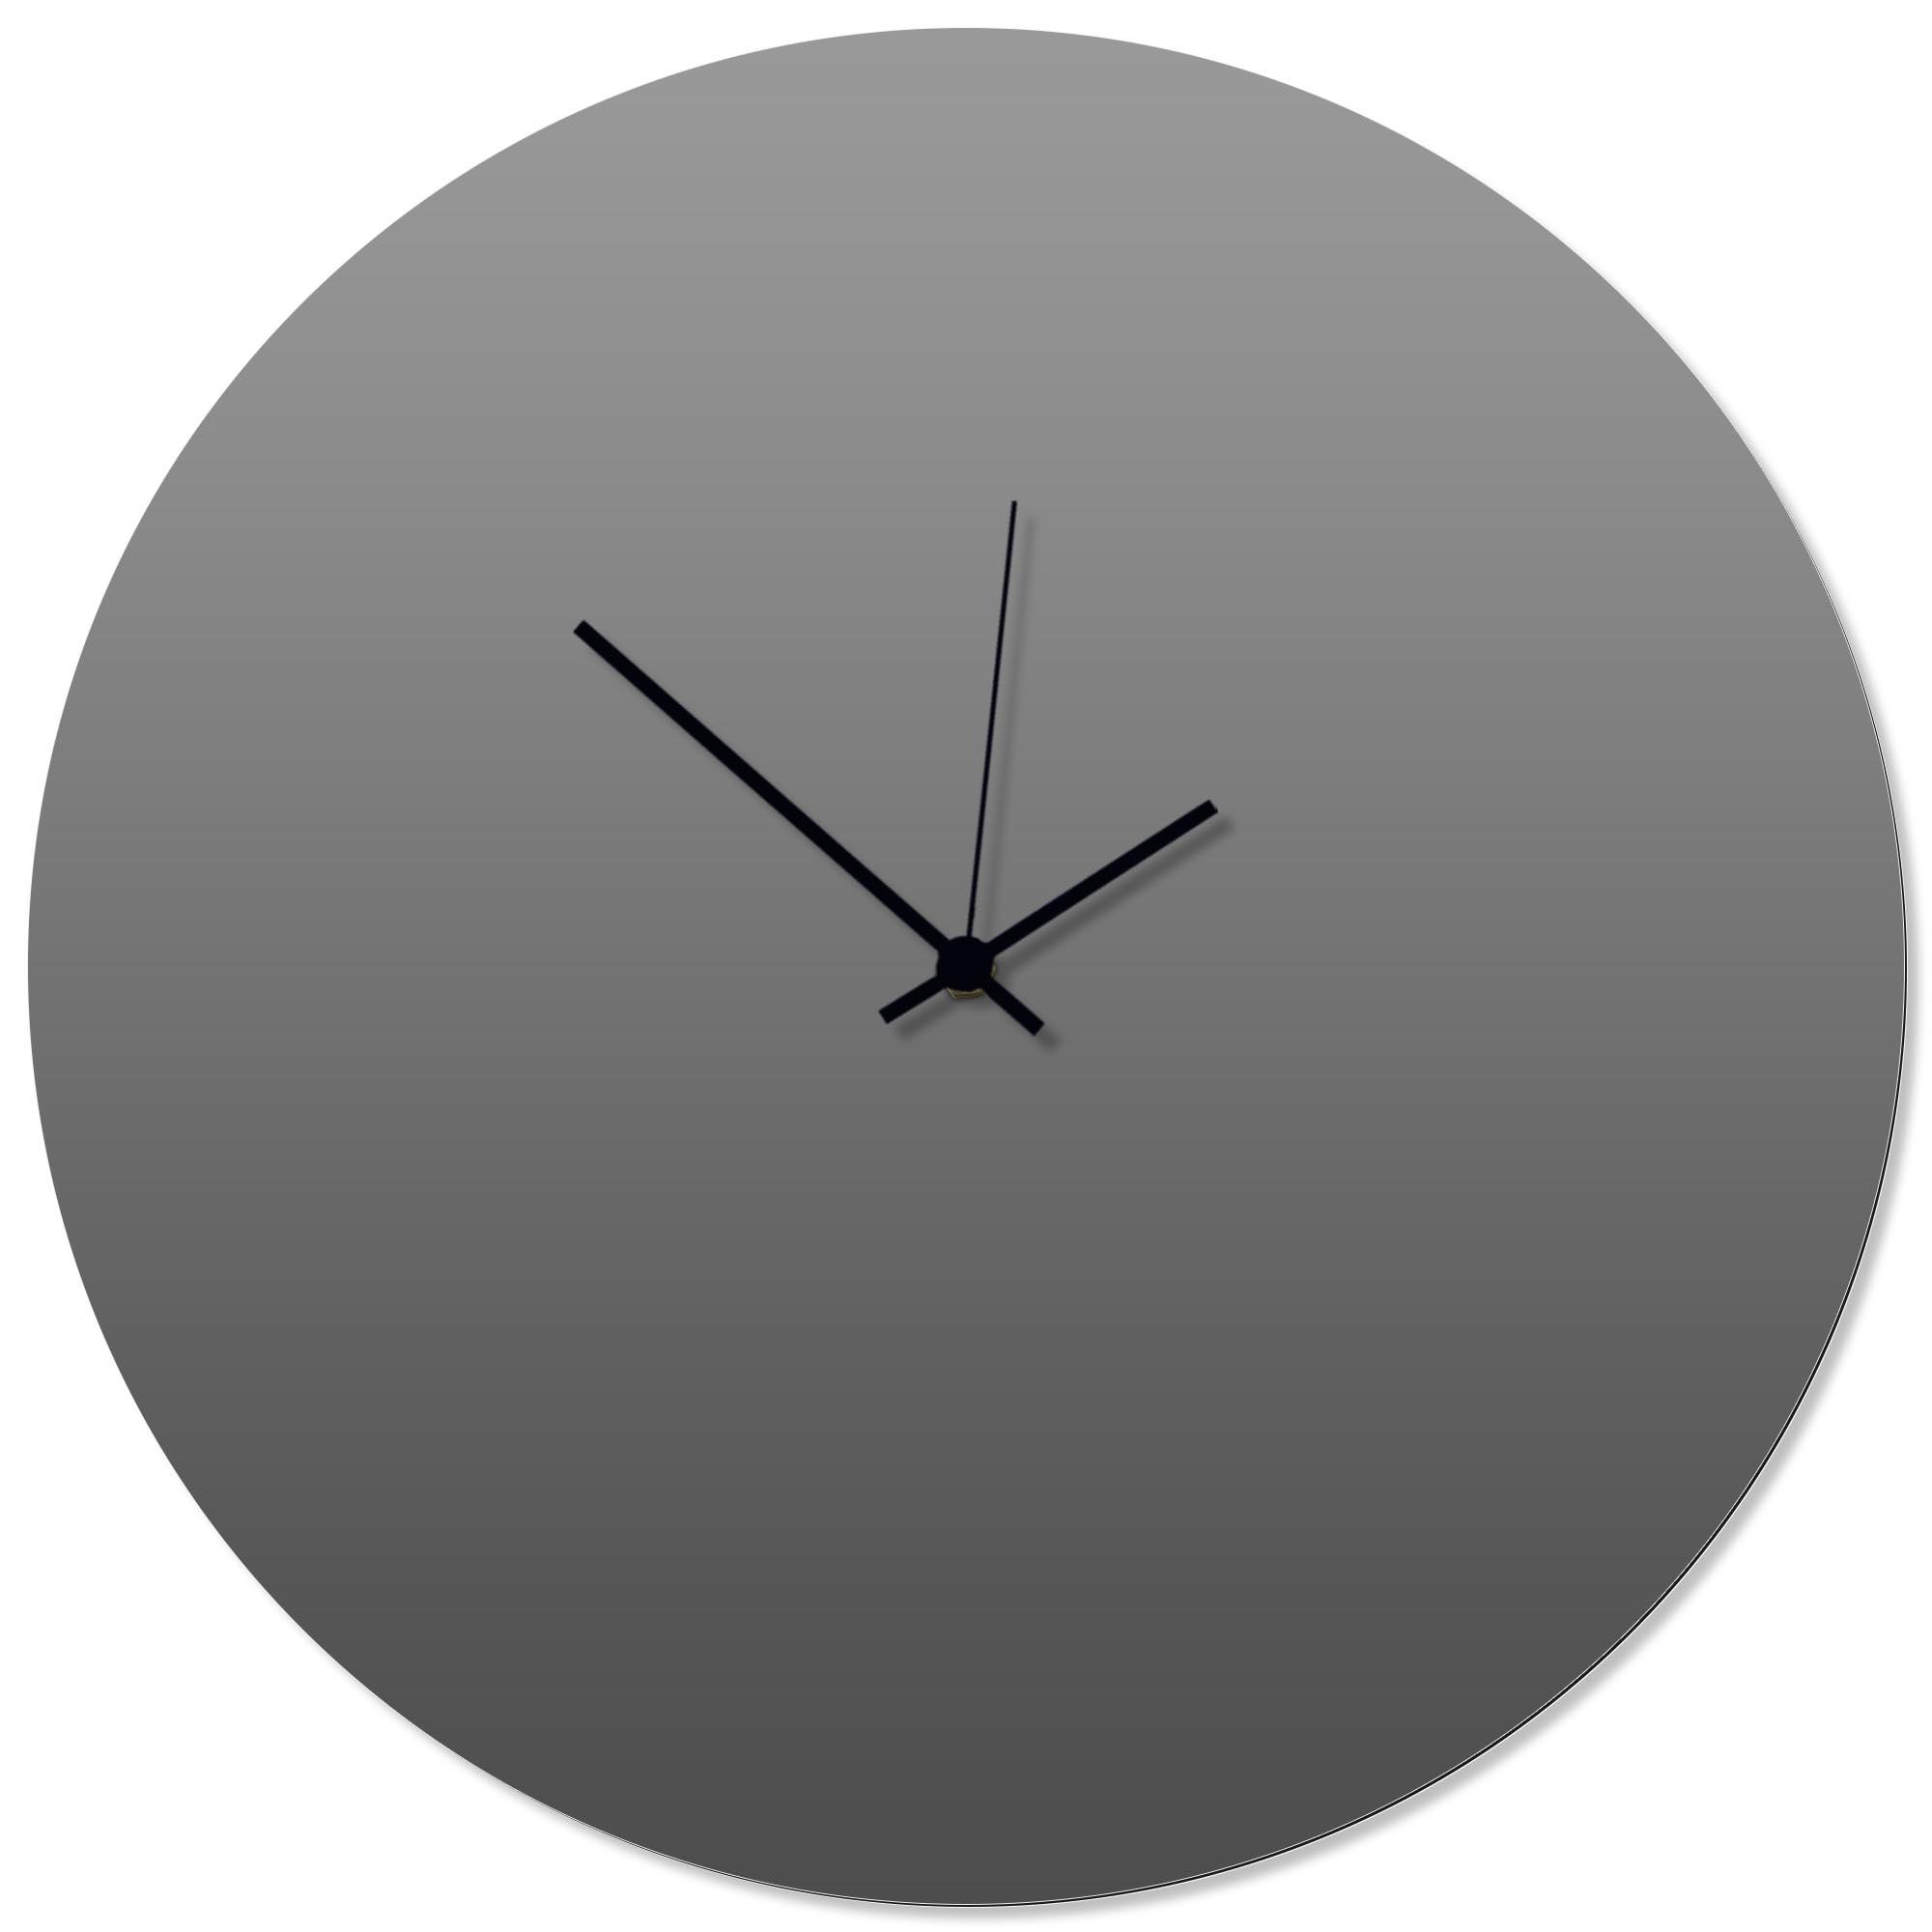 Grayout Black Circle Clock Large 23x23in. Aluminum Polymetal